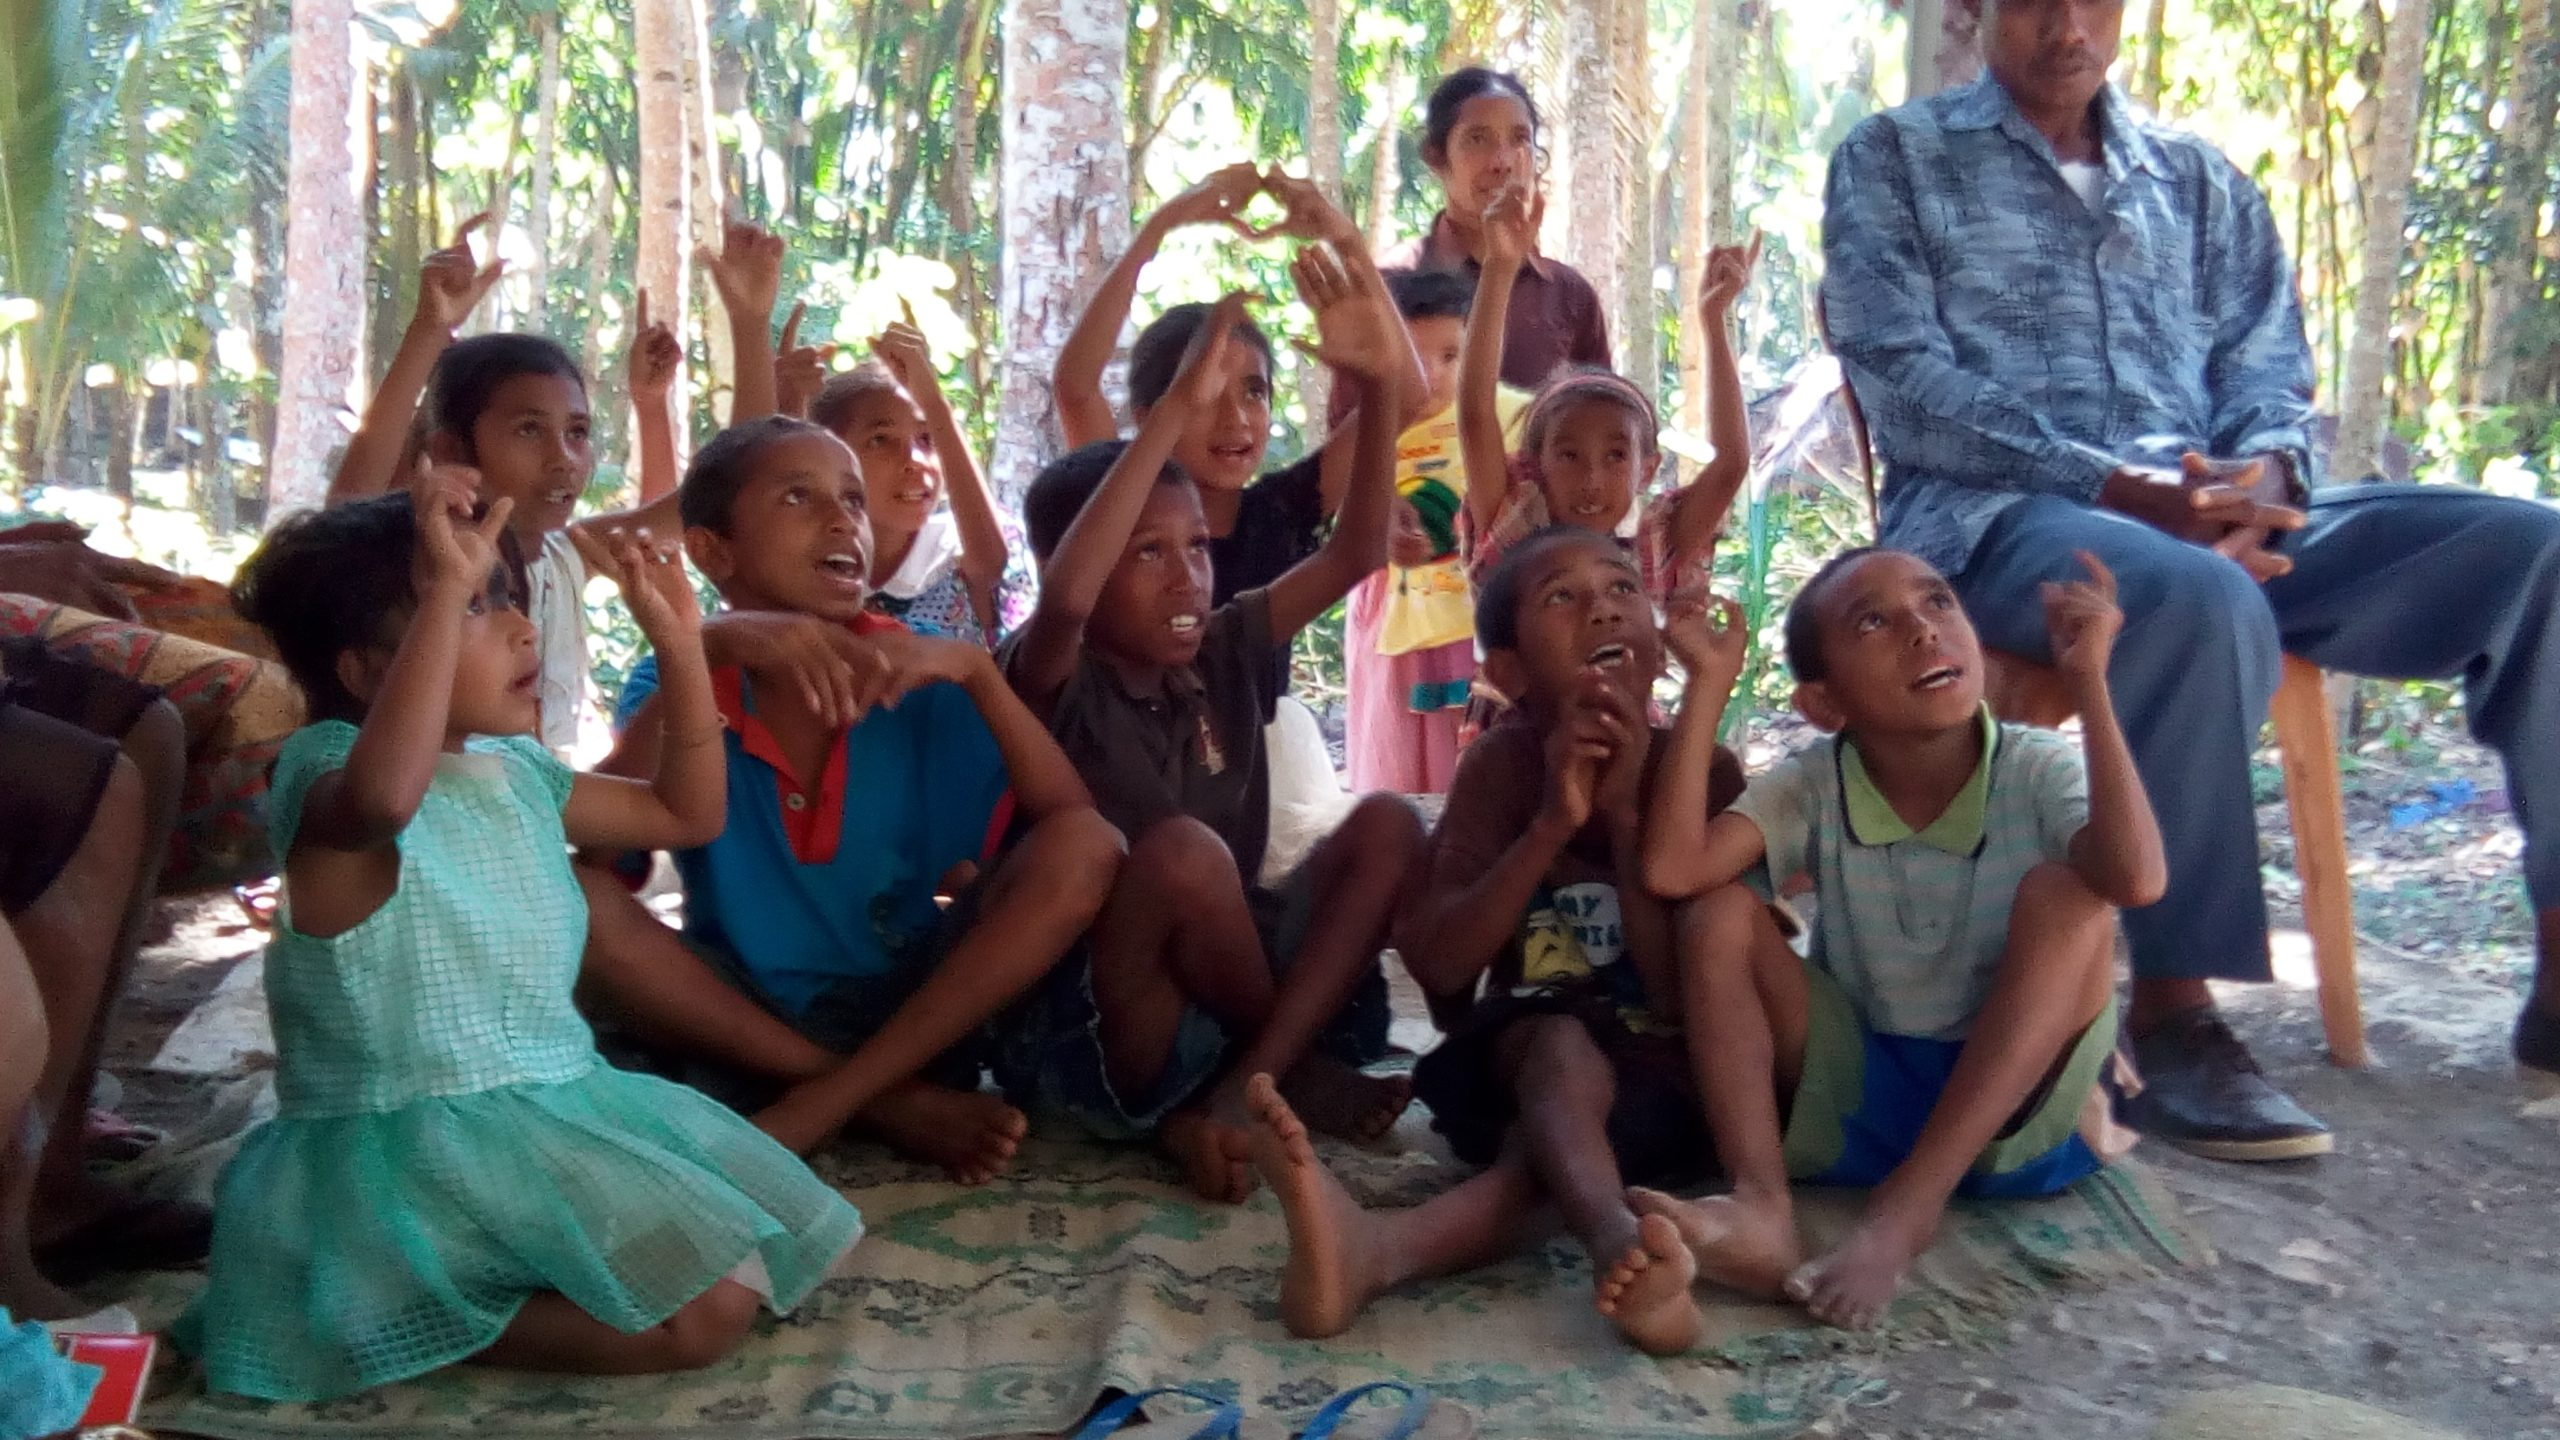 East_Timor_Tom_Liddle_IMG_20180714_144613.jpeg